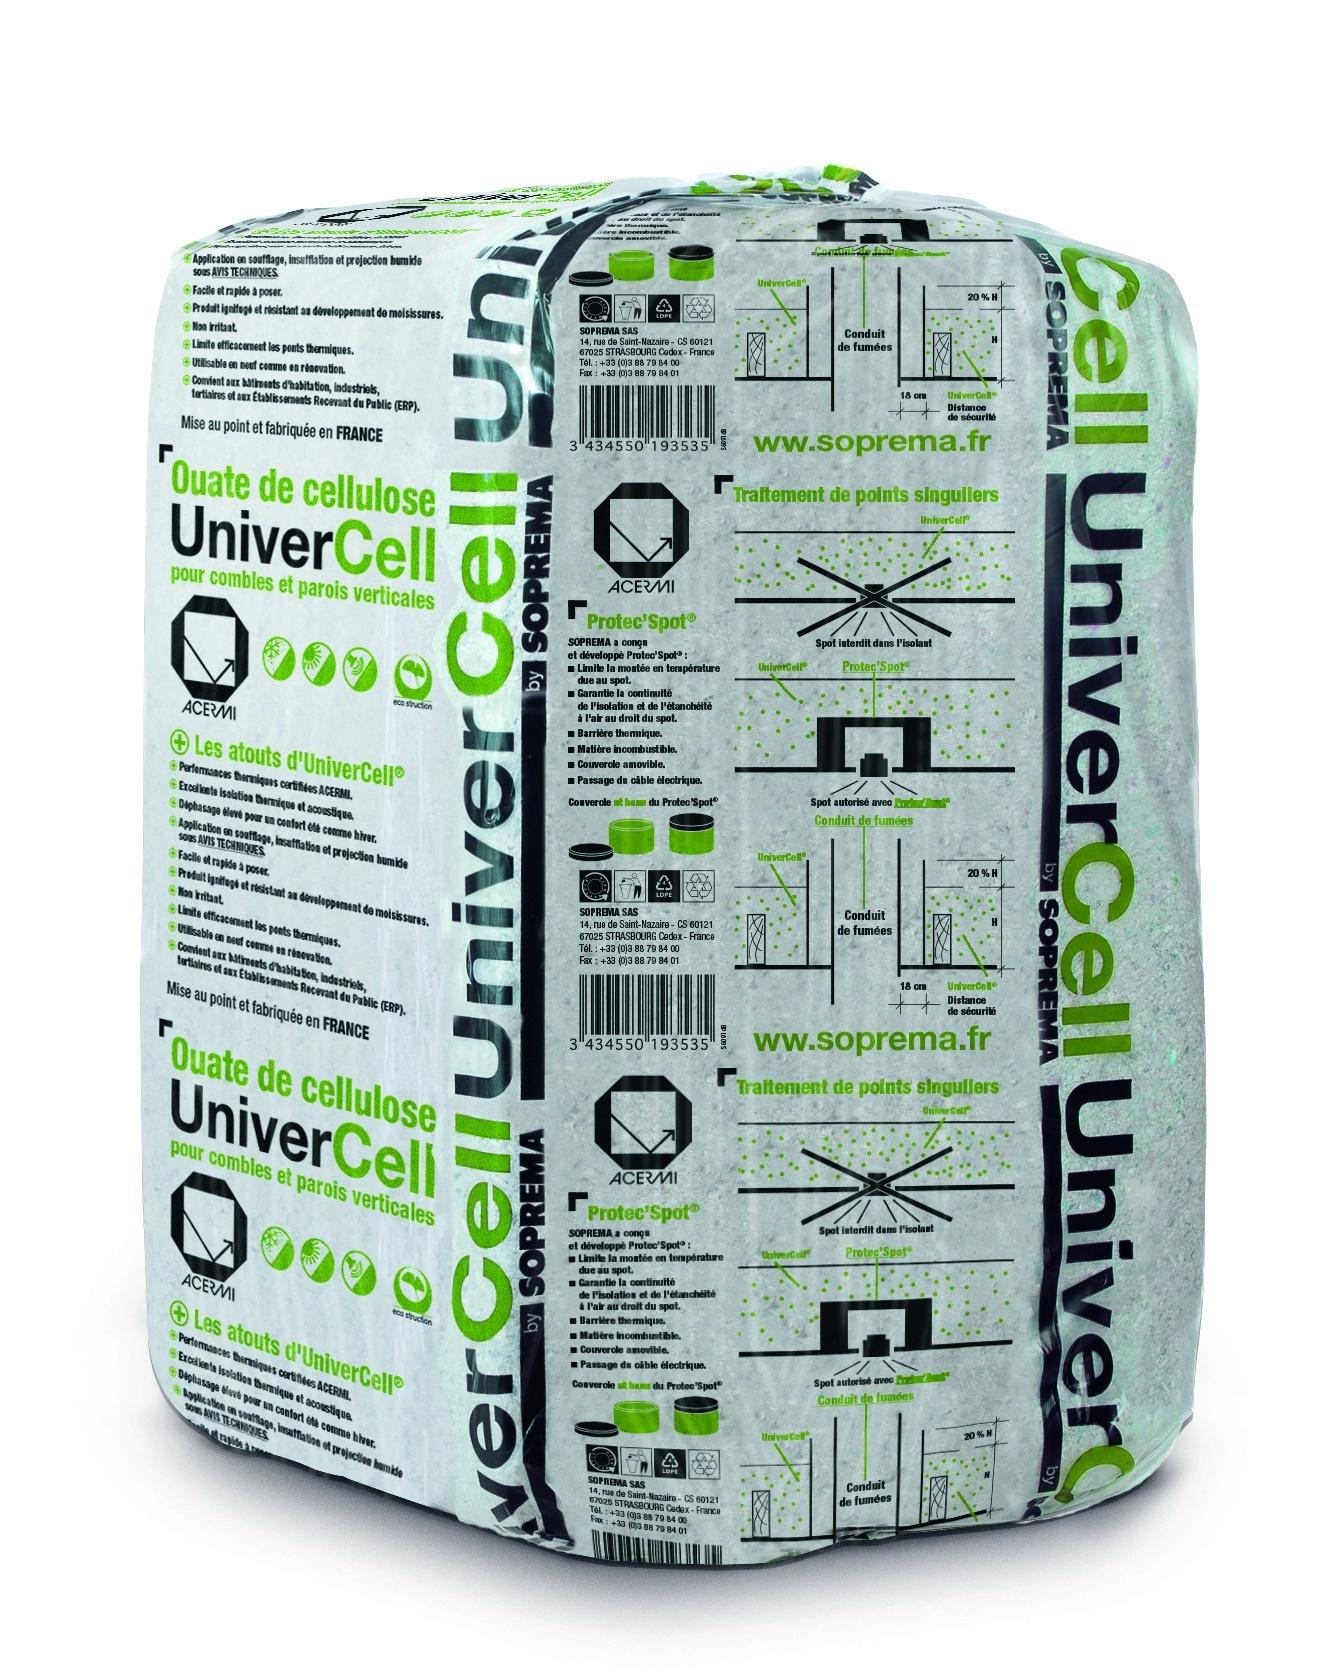 Ouate de cellulose isolation produits maurin membre - Ouate de cellulose brico depot ...